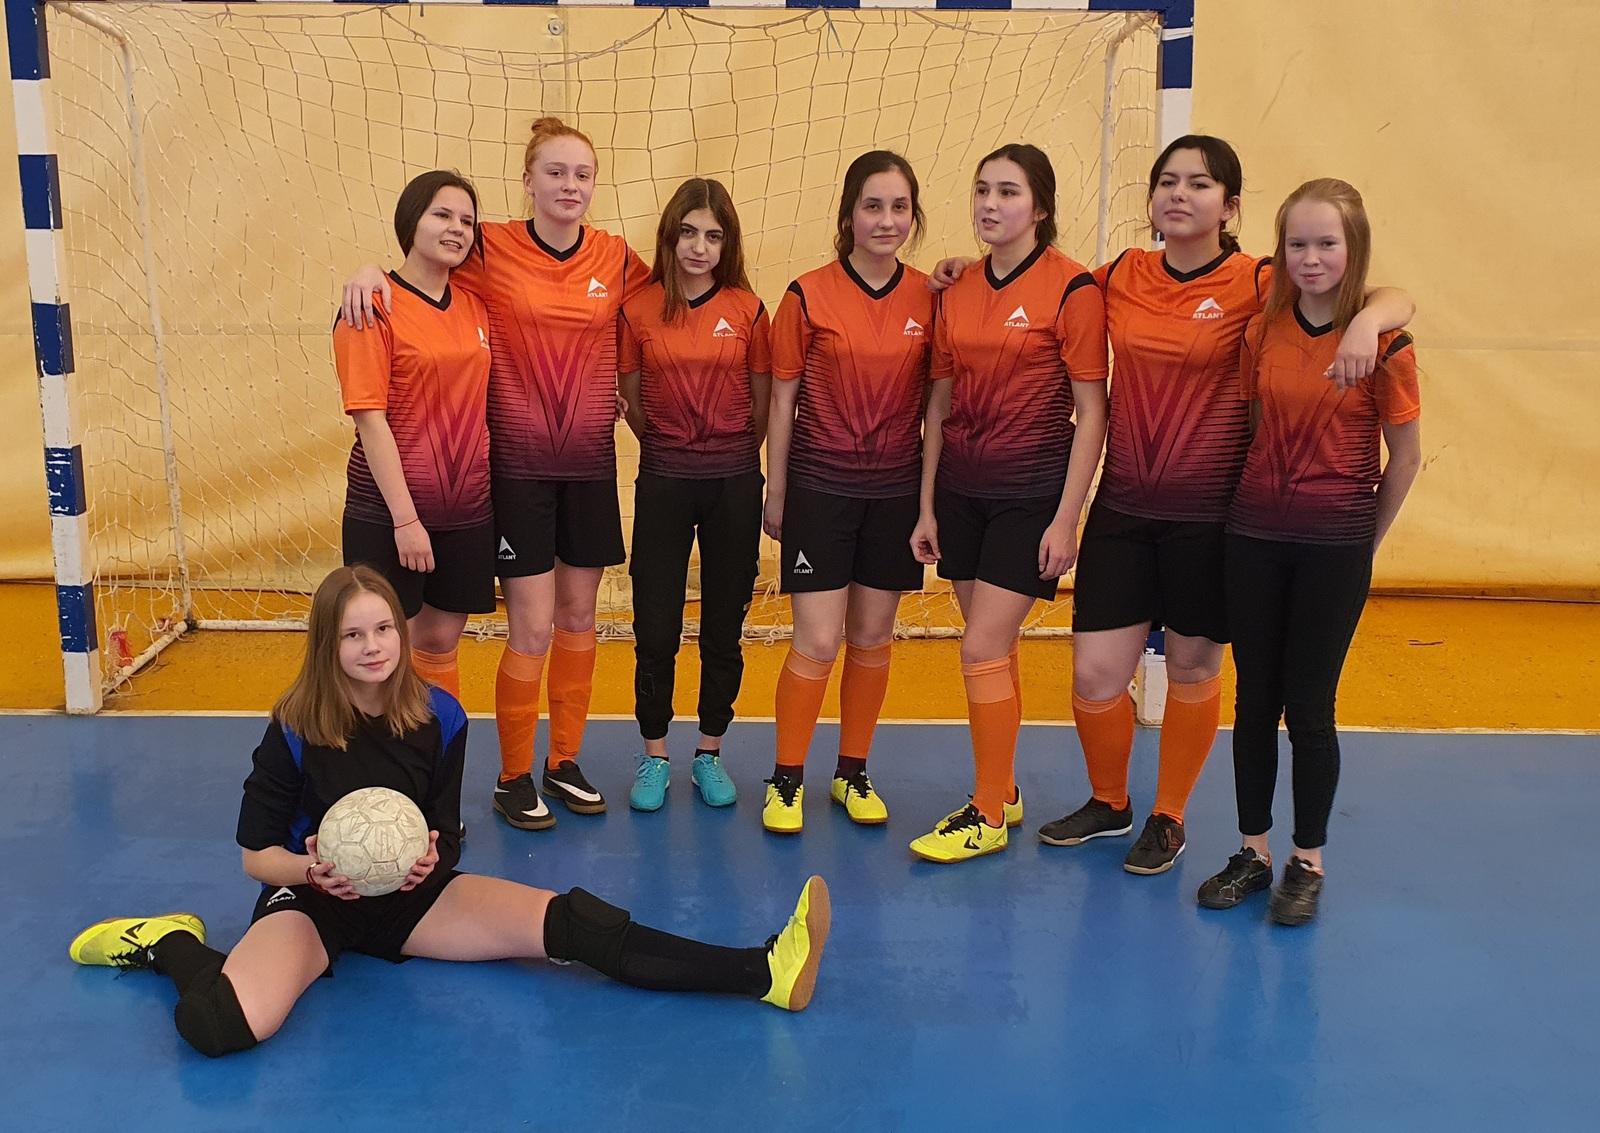 Команда Force из Малого Василево стала открытием чемпионата области по мини-футболу среди женщин